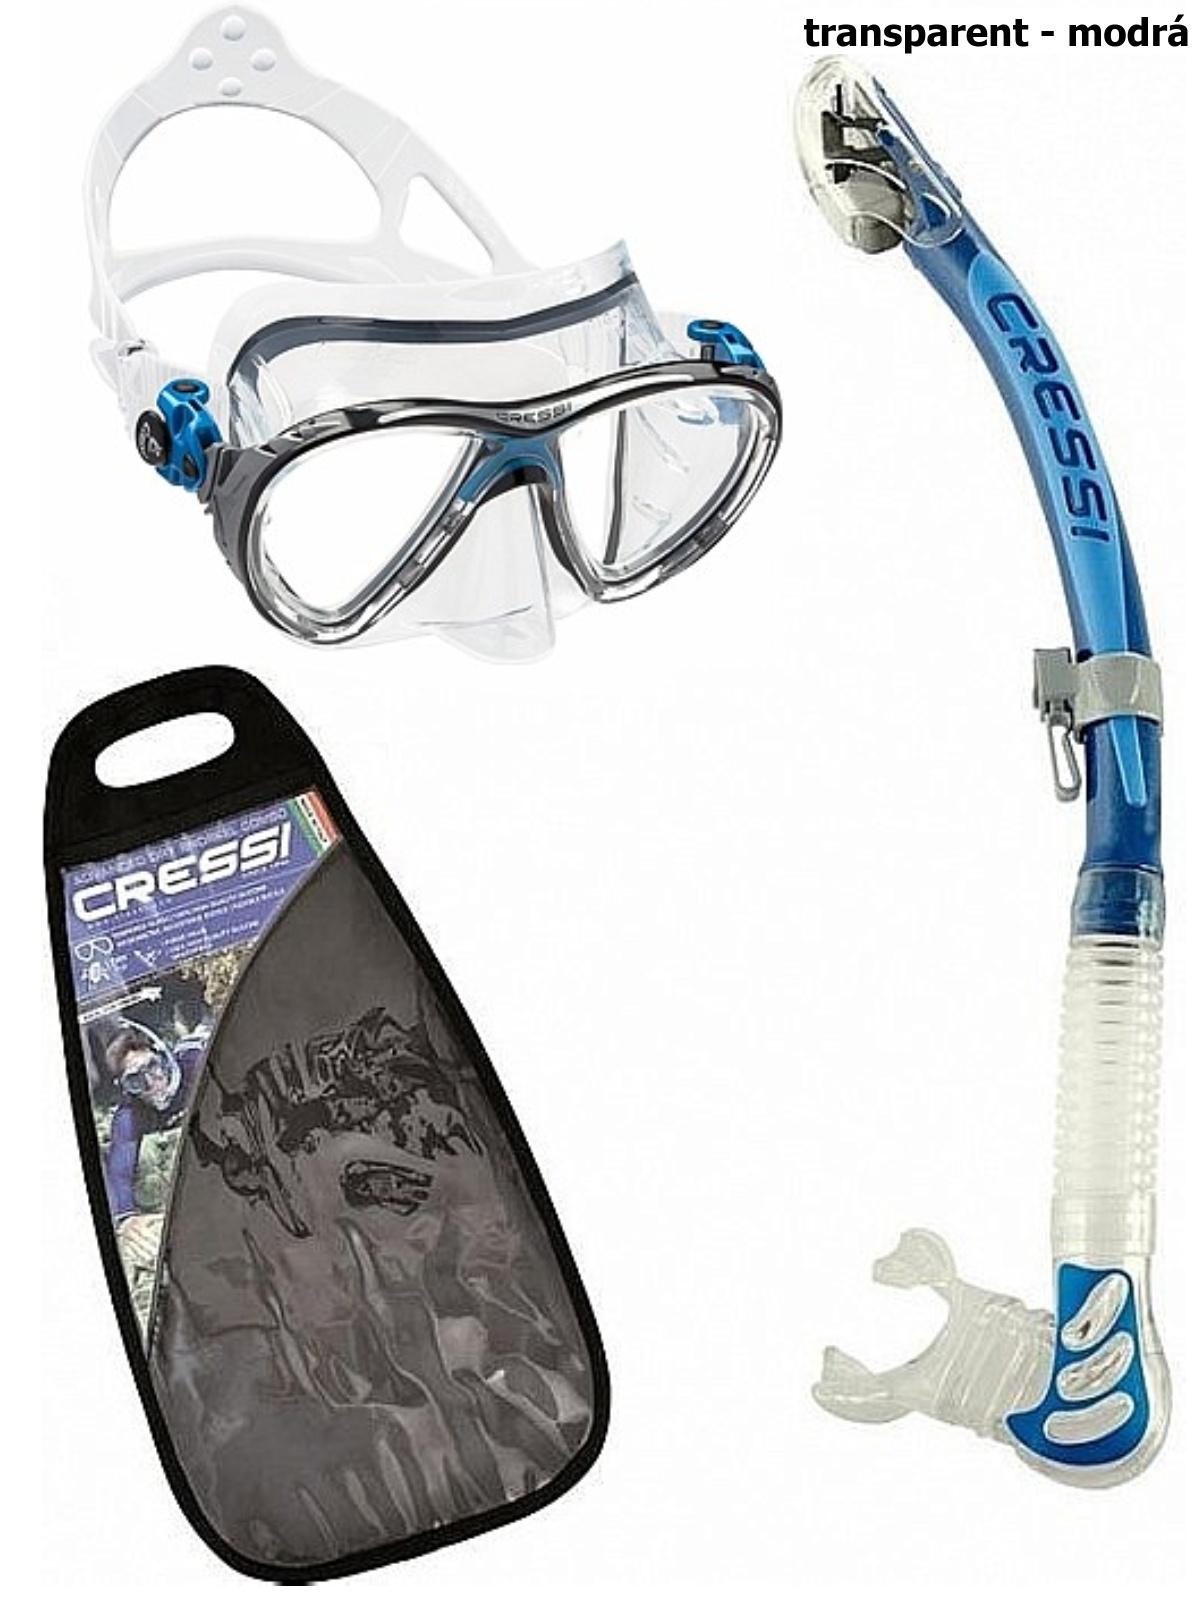 Potápačský set CRESSI Big Eyes+Alpha Ultra Dry - transparent modrý